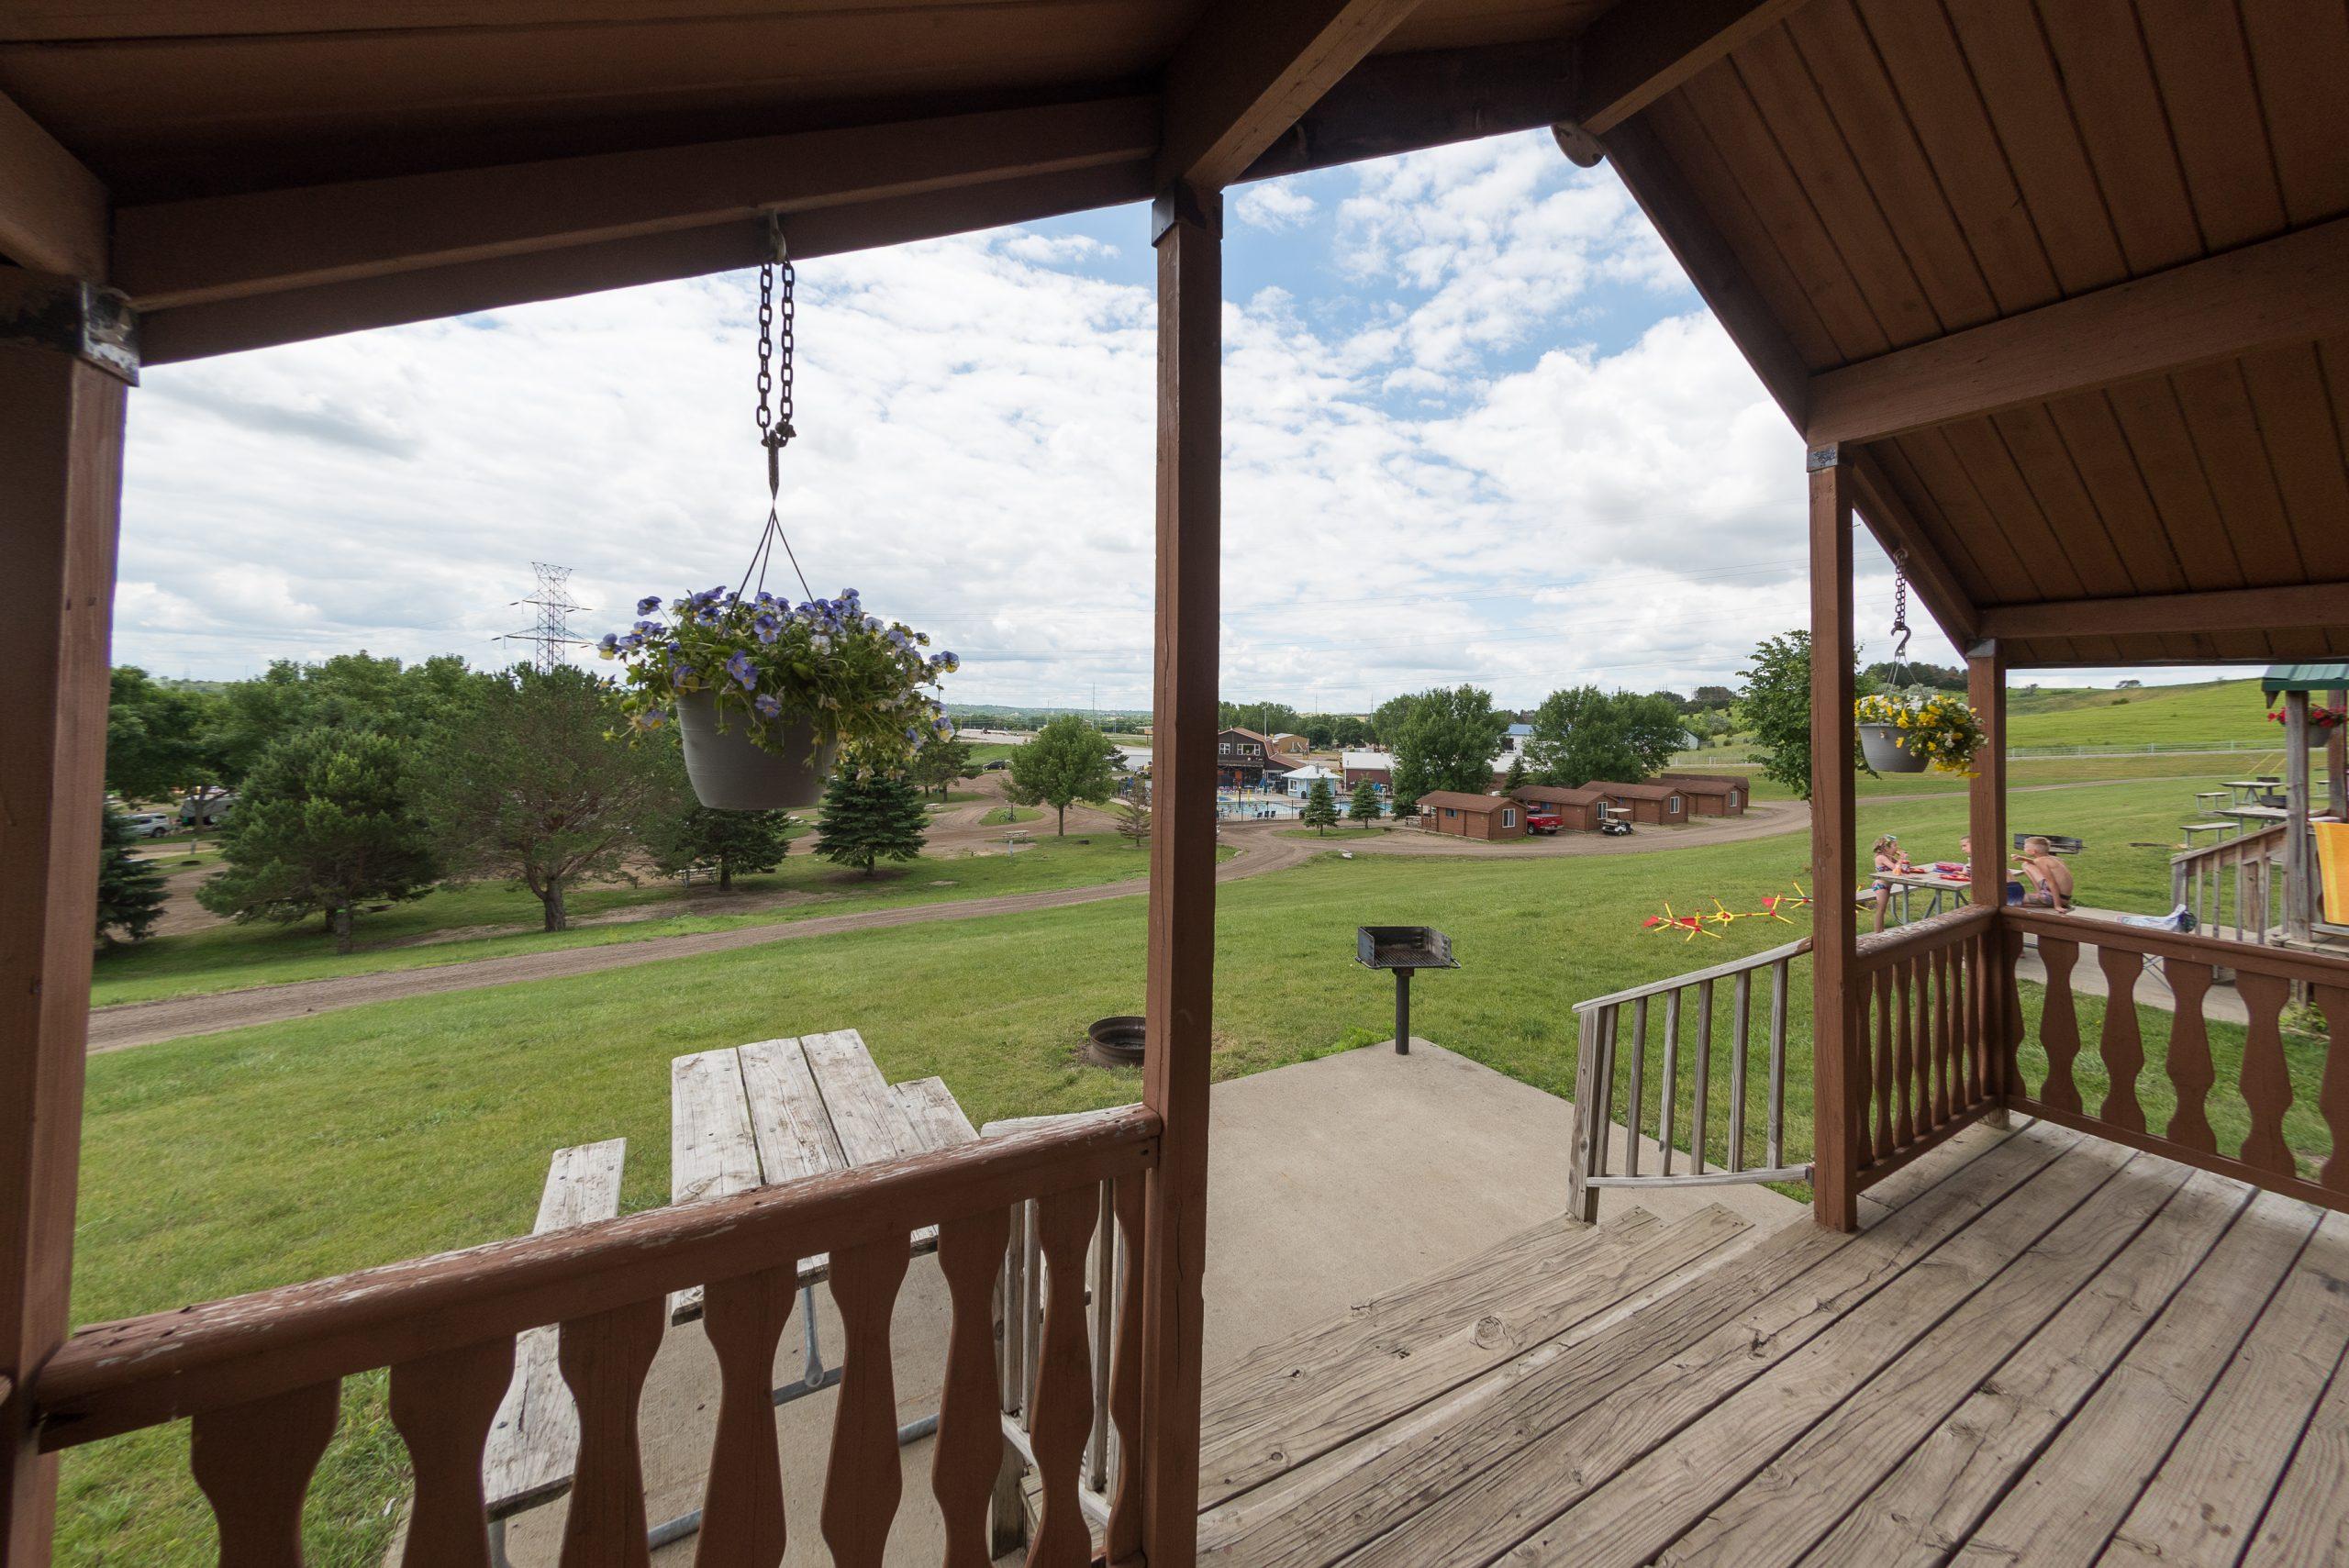 170 9230 yogi bear campground 20200623 at RV park Sioux Falls SD